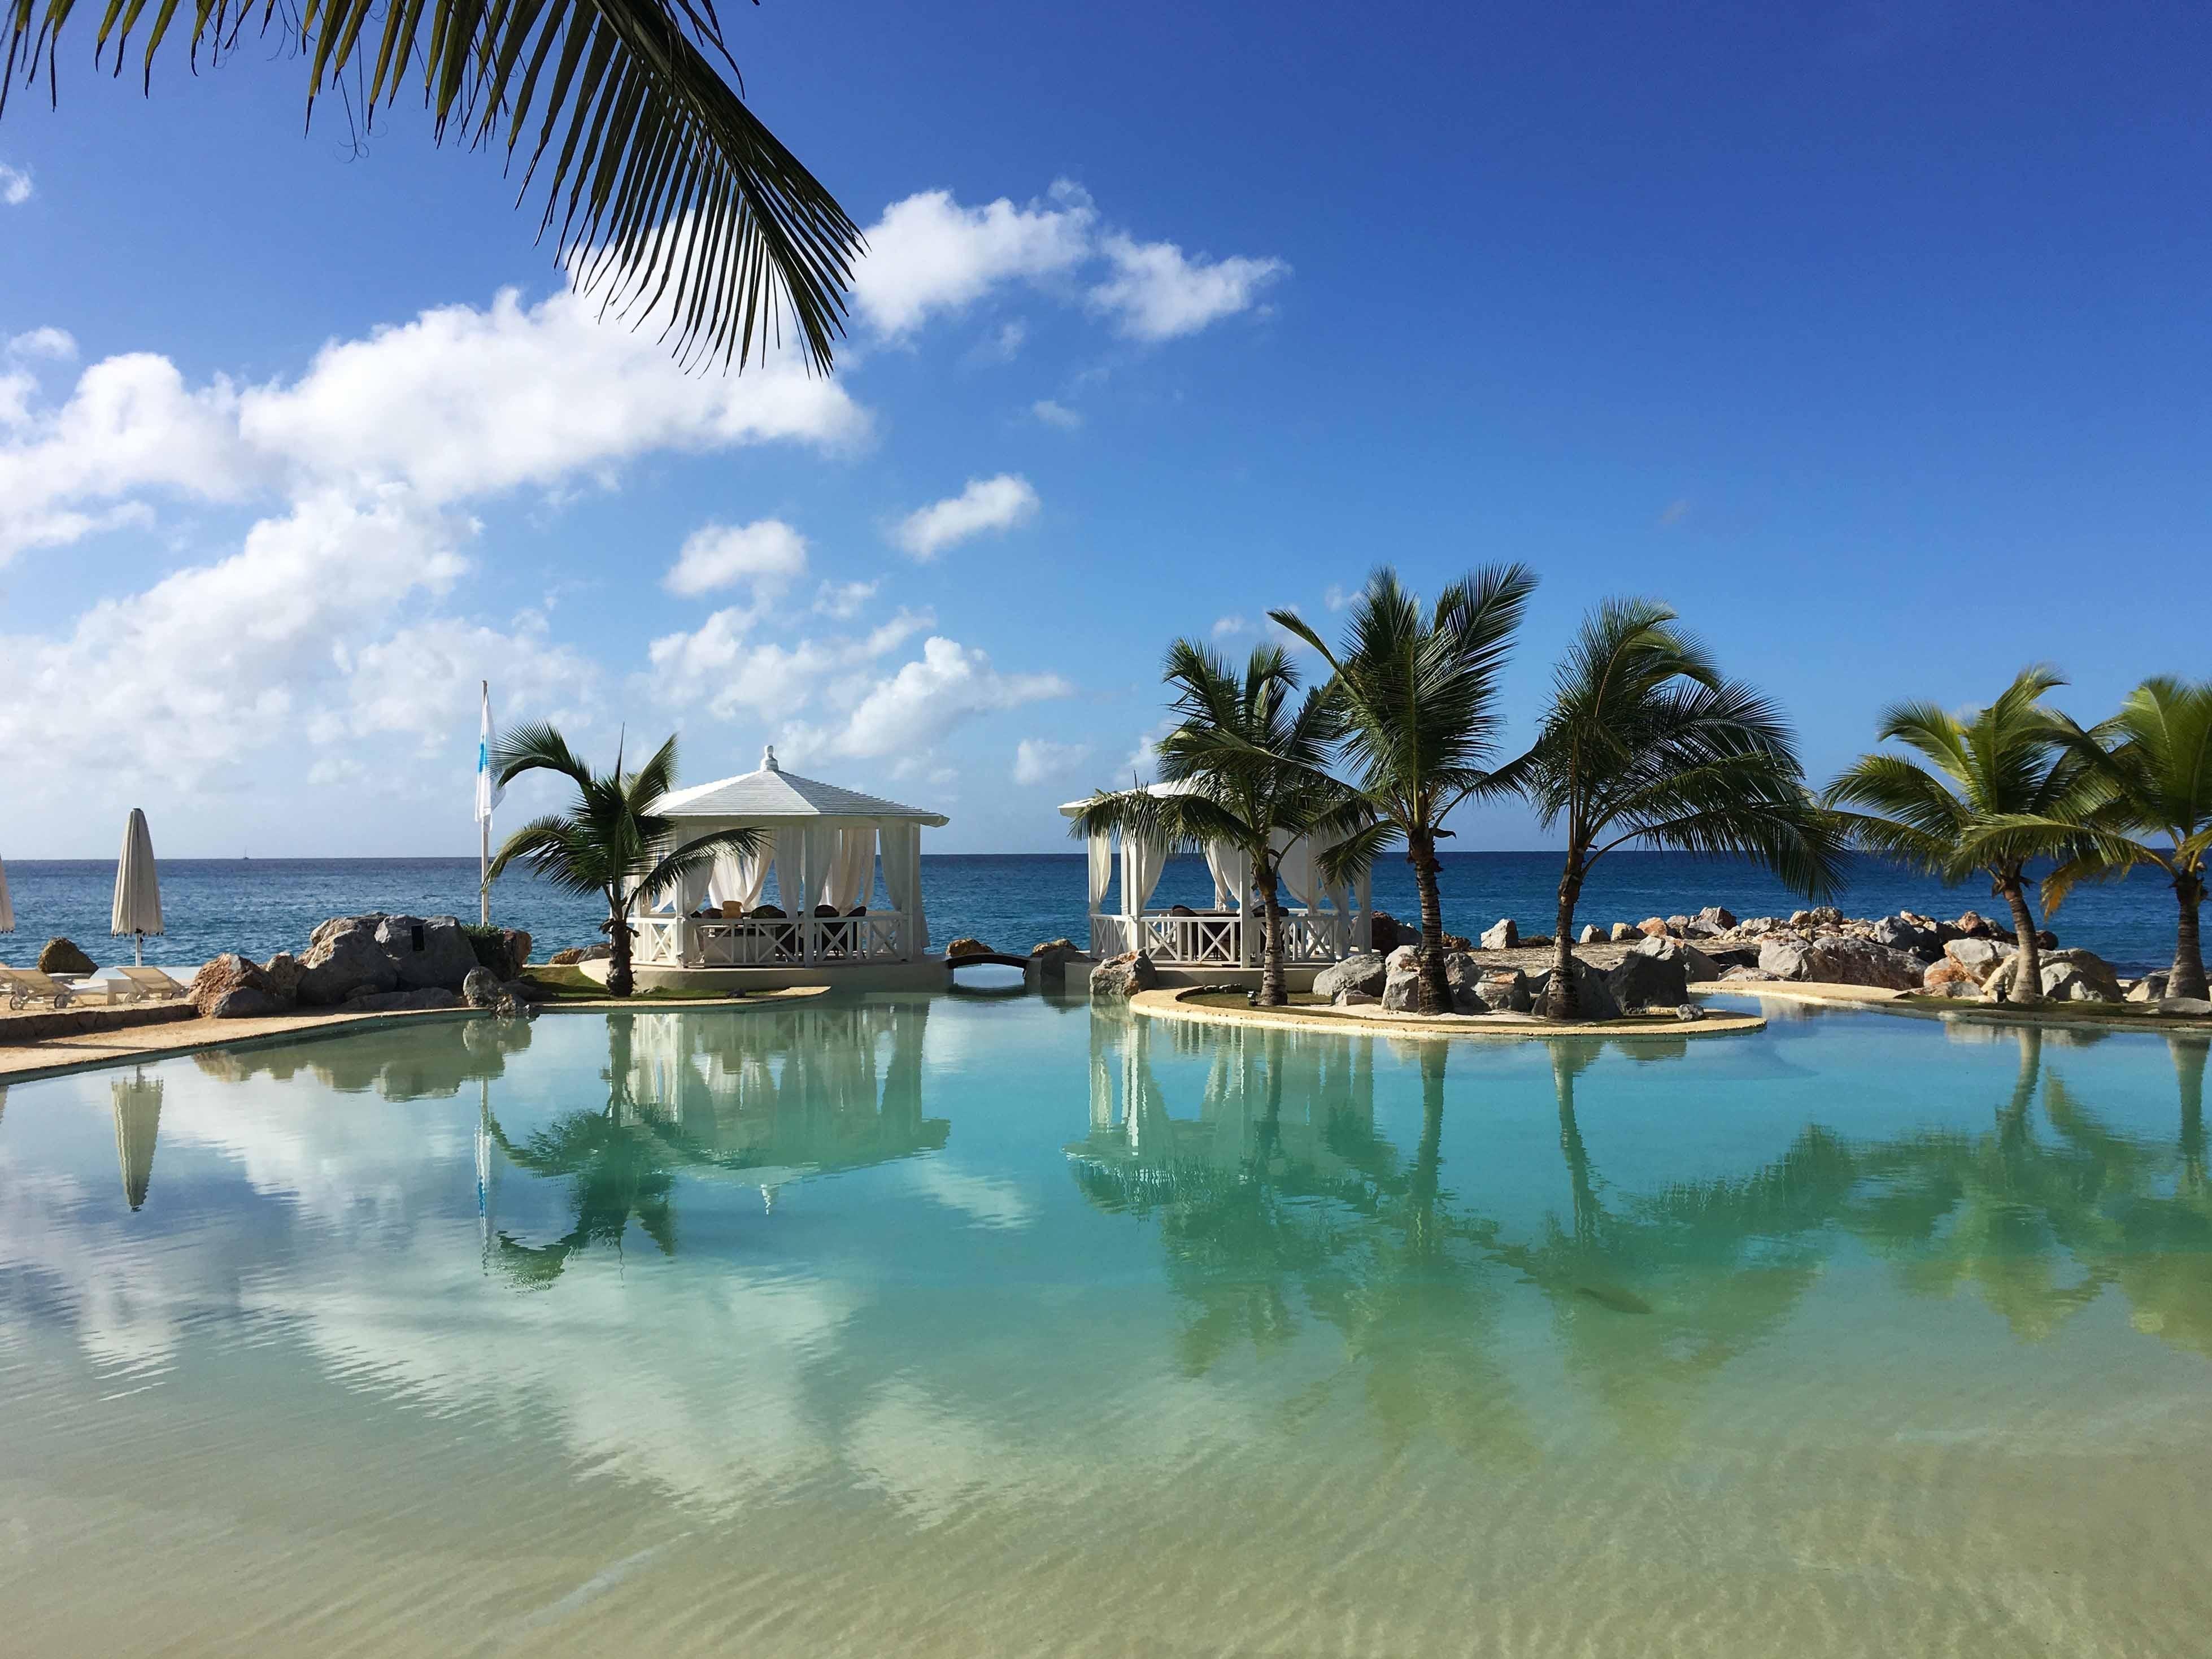 La splendida piscina oceanica di Santo Domingo - Piscine